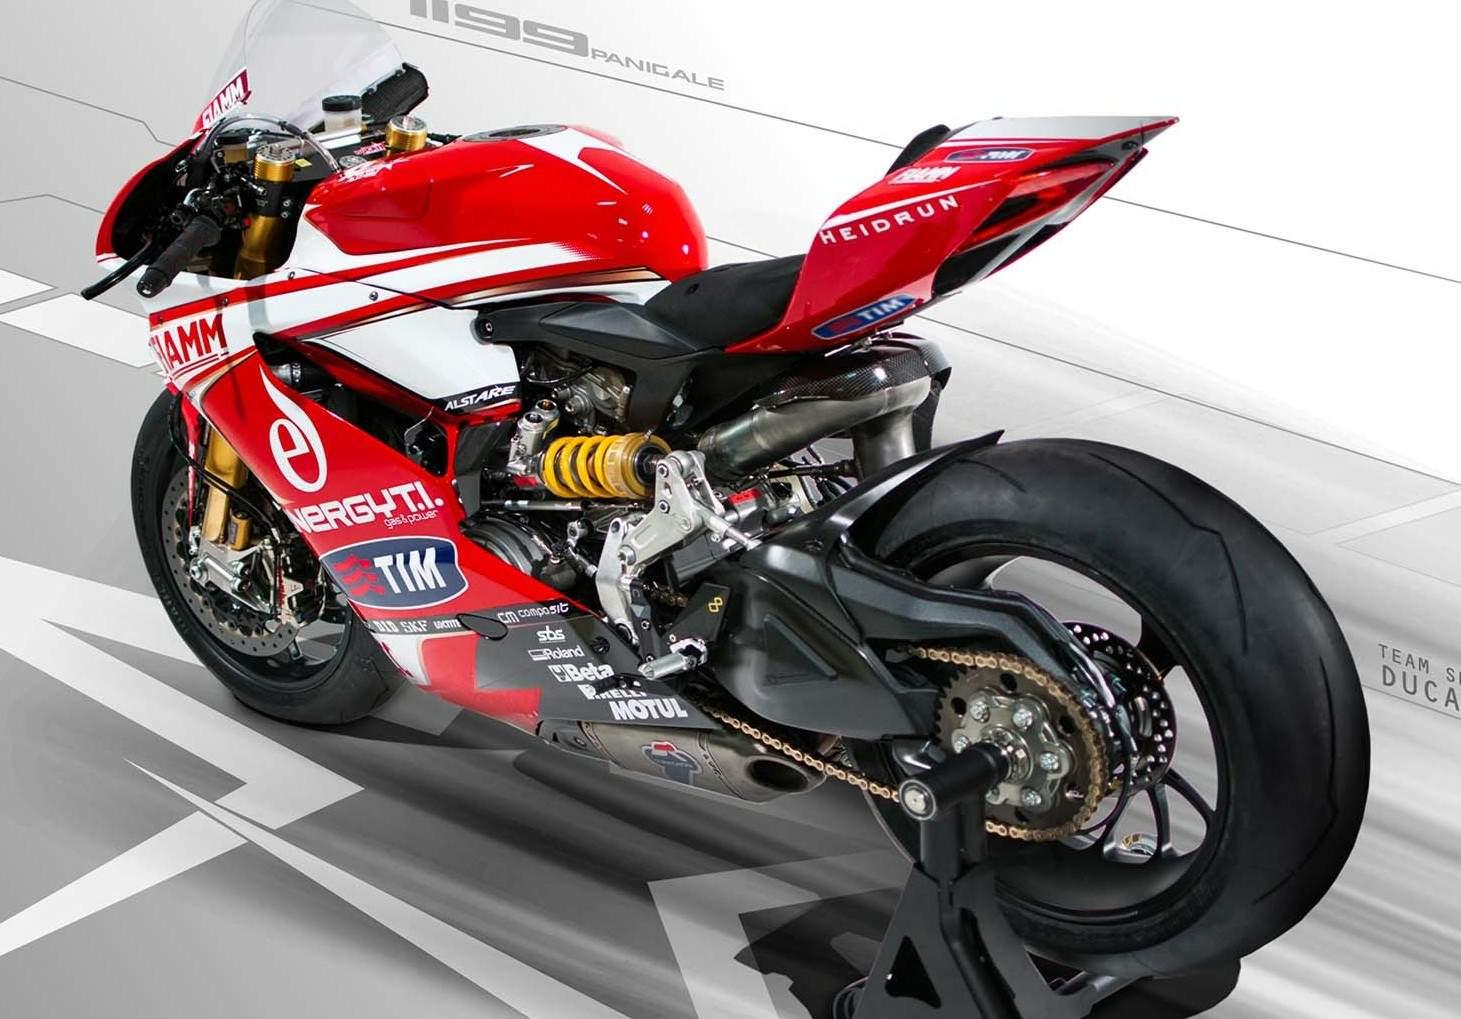 Ducati 1199 Panigale R WSBK, 2013 Ducati Alstare 1199 Panigale R World Superbike